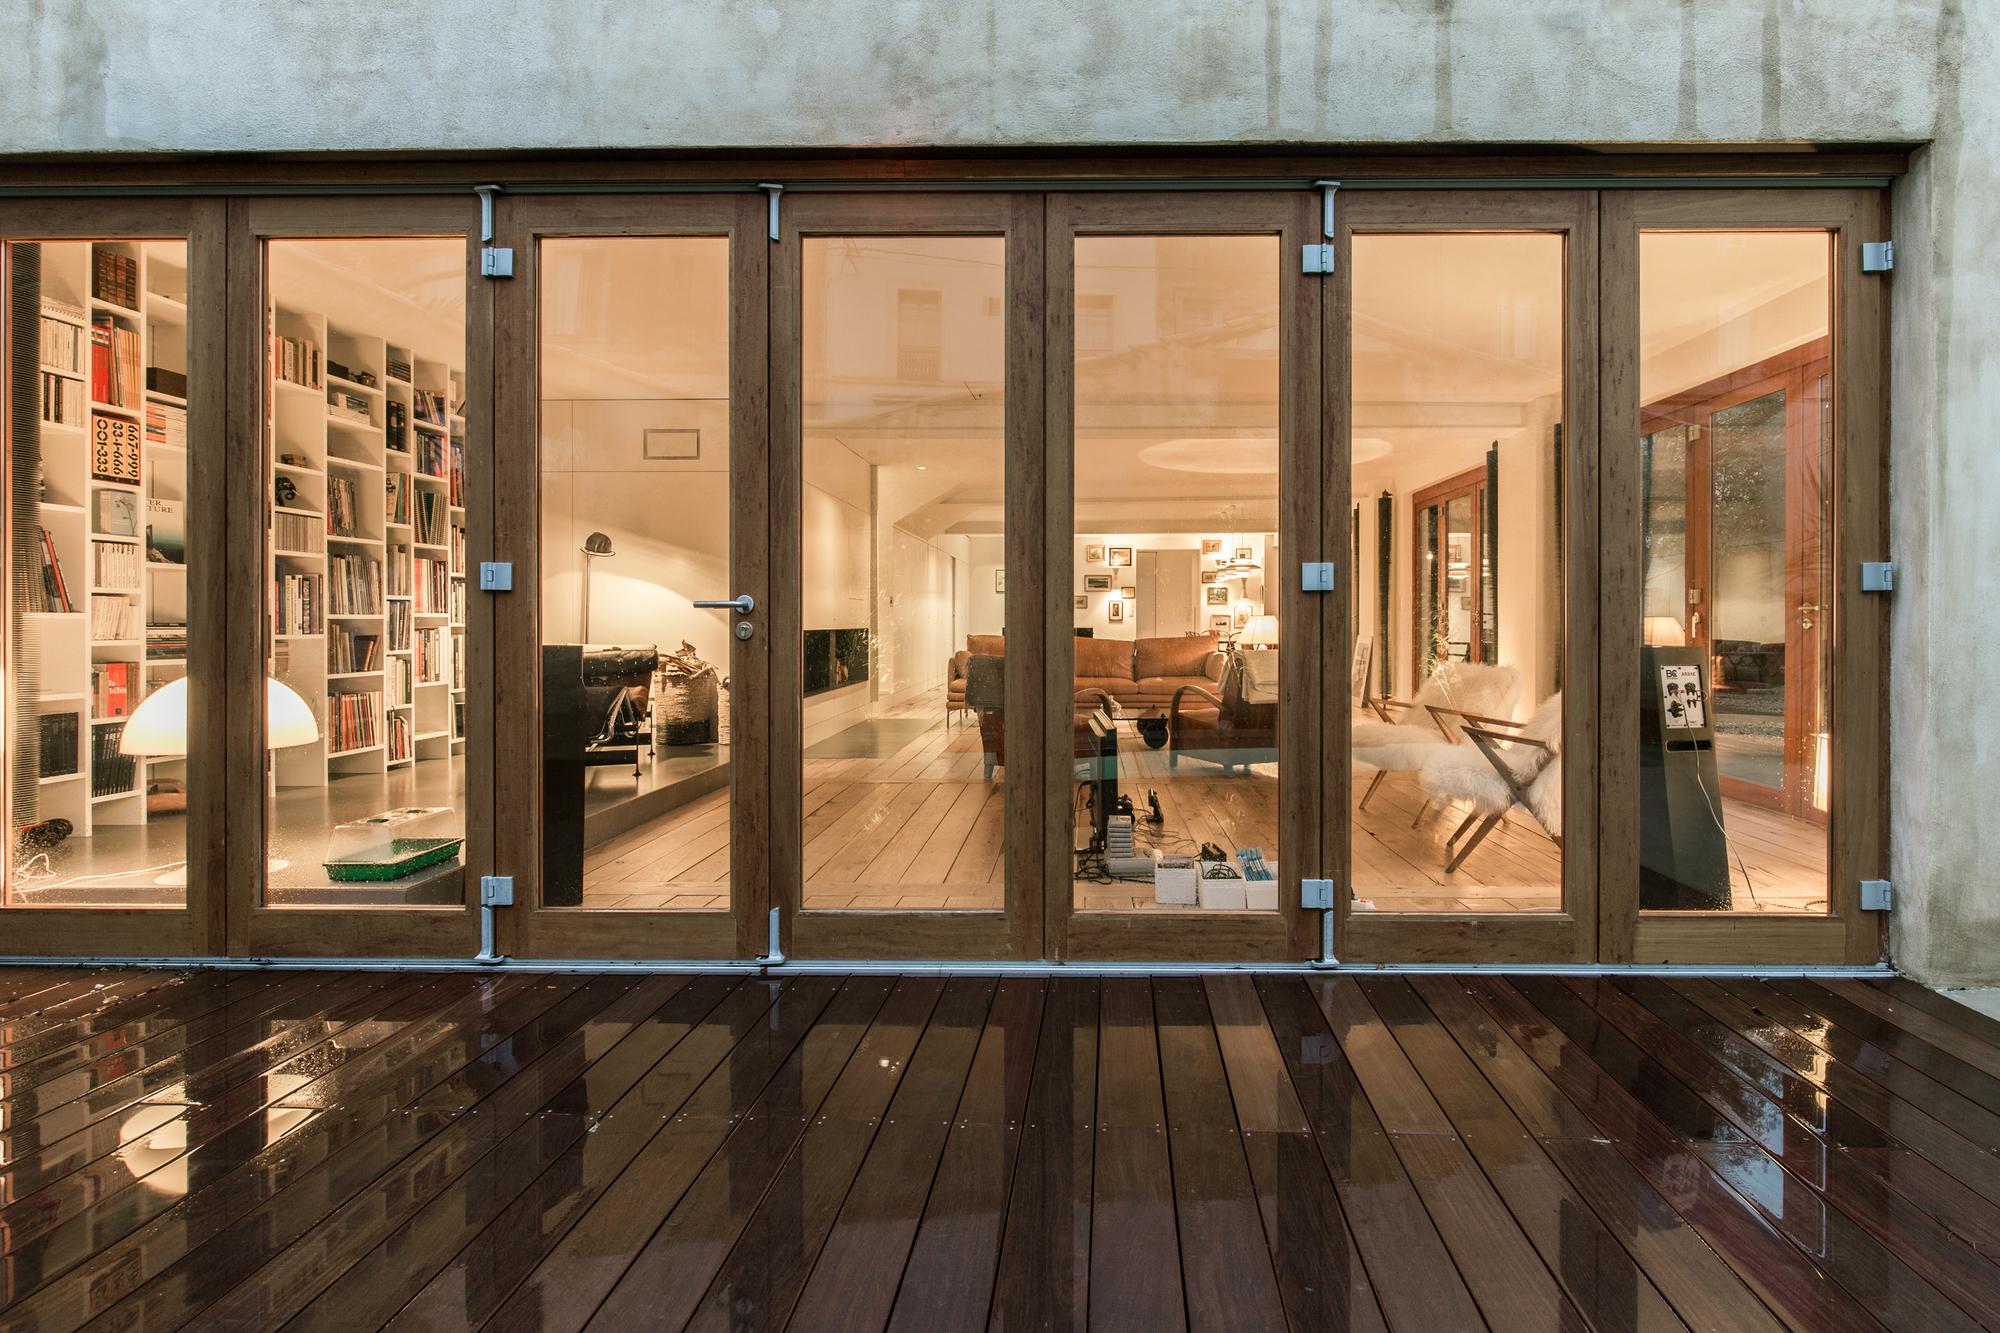 galer a de casa msr brengues le pavec architectes 4. Black Bedroom Furniture Sets. Home Design Ideas